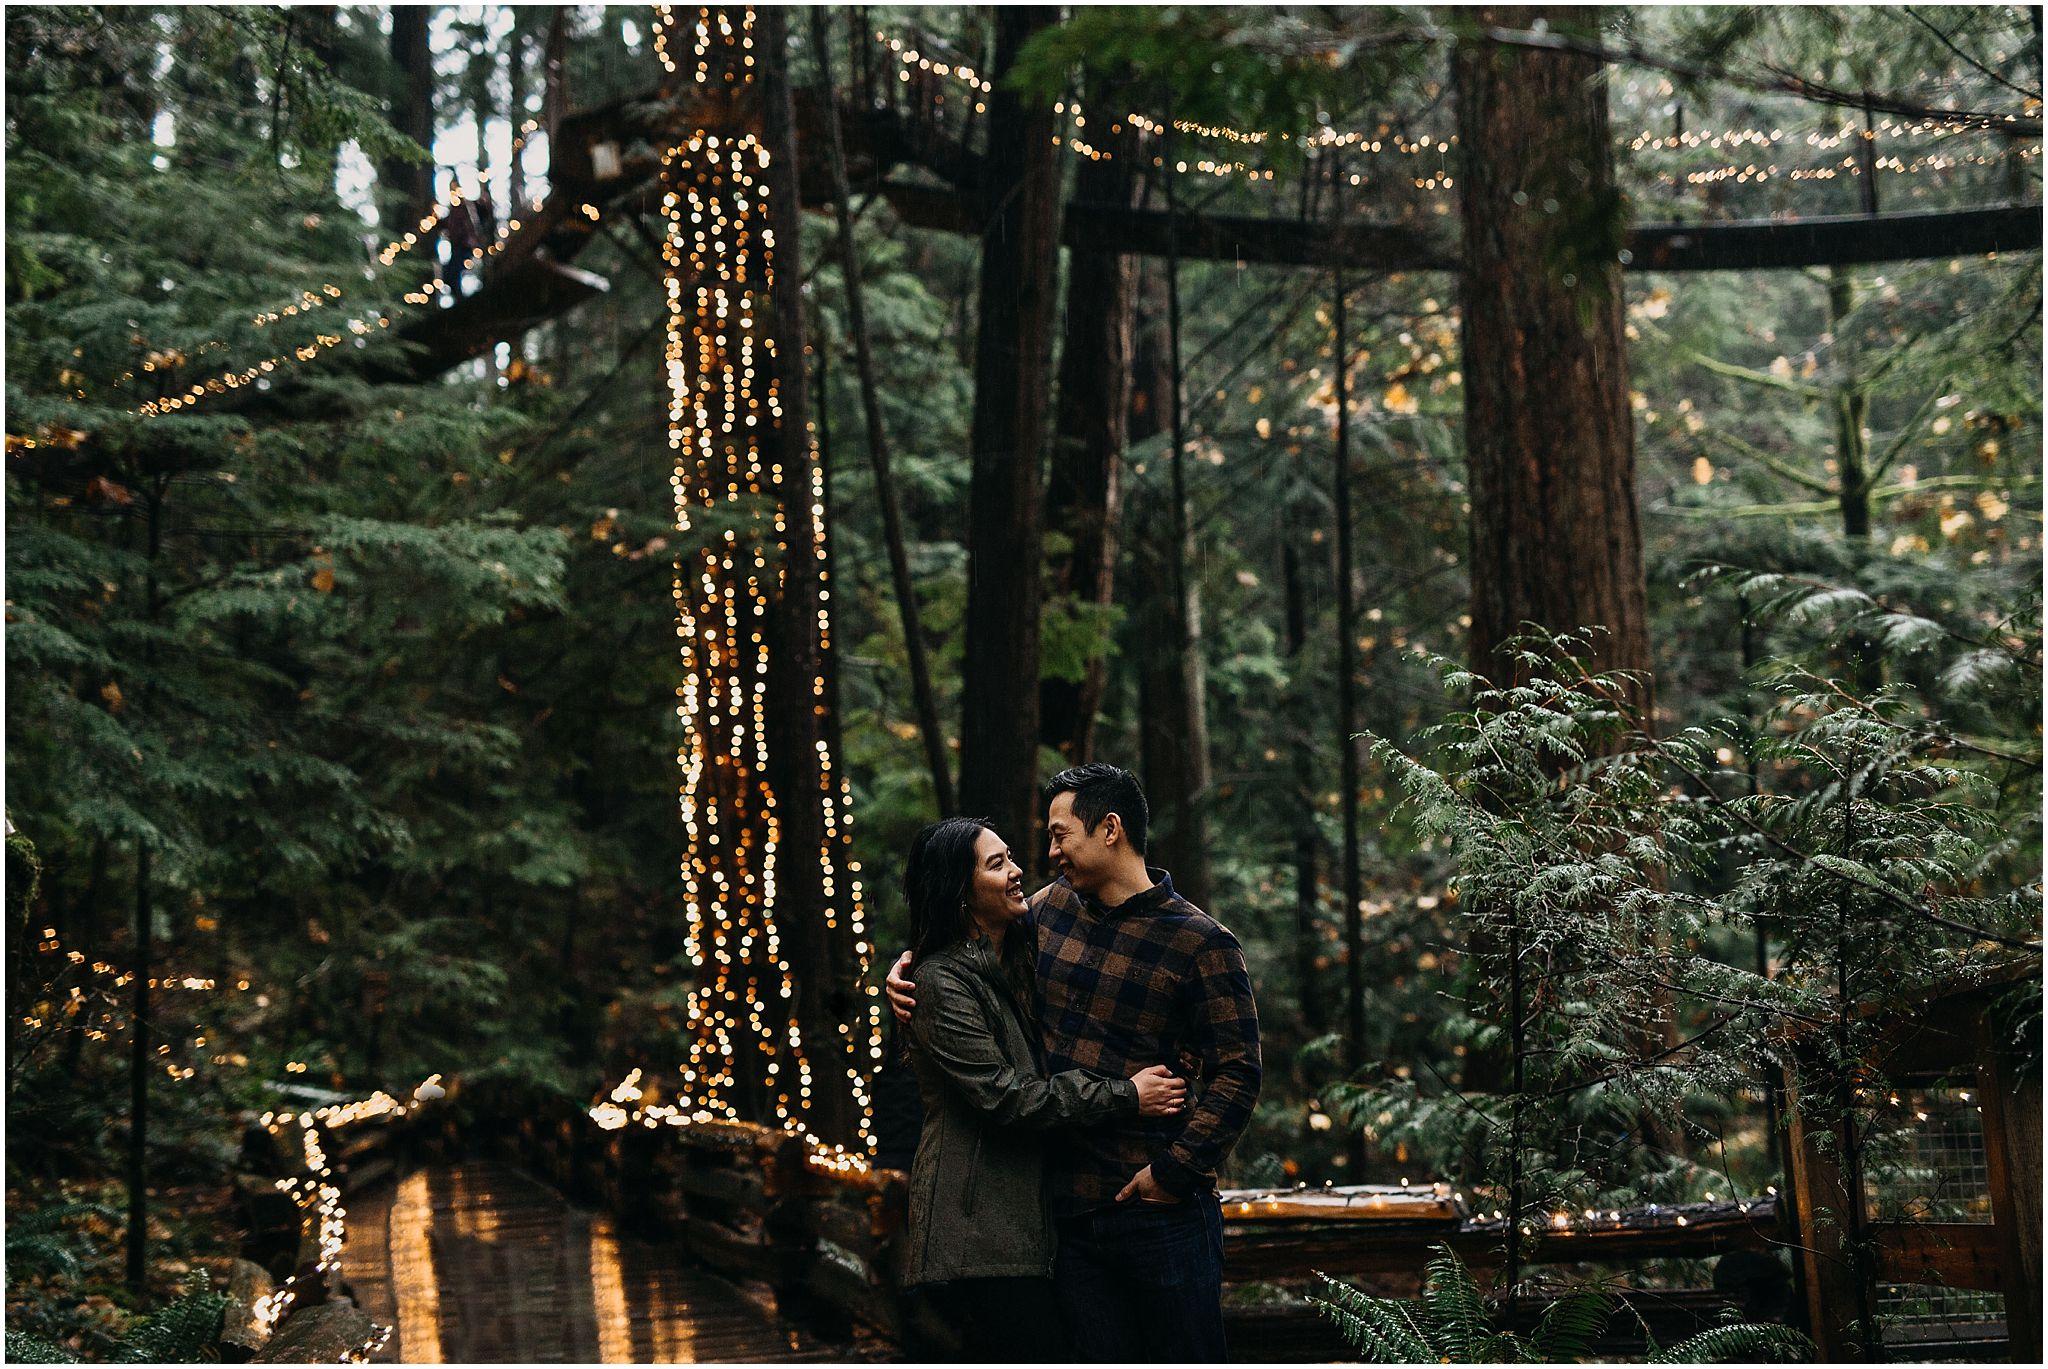 capilano suspension bridge canyon lights engagement photos couple